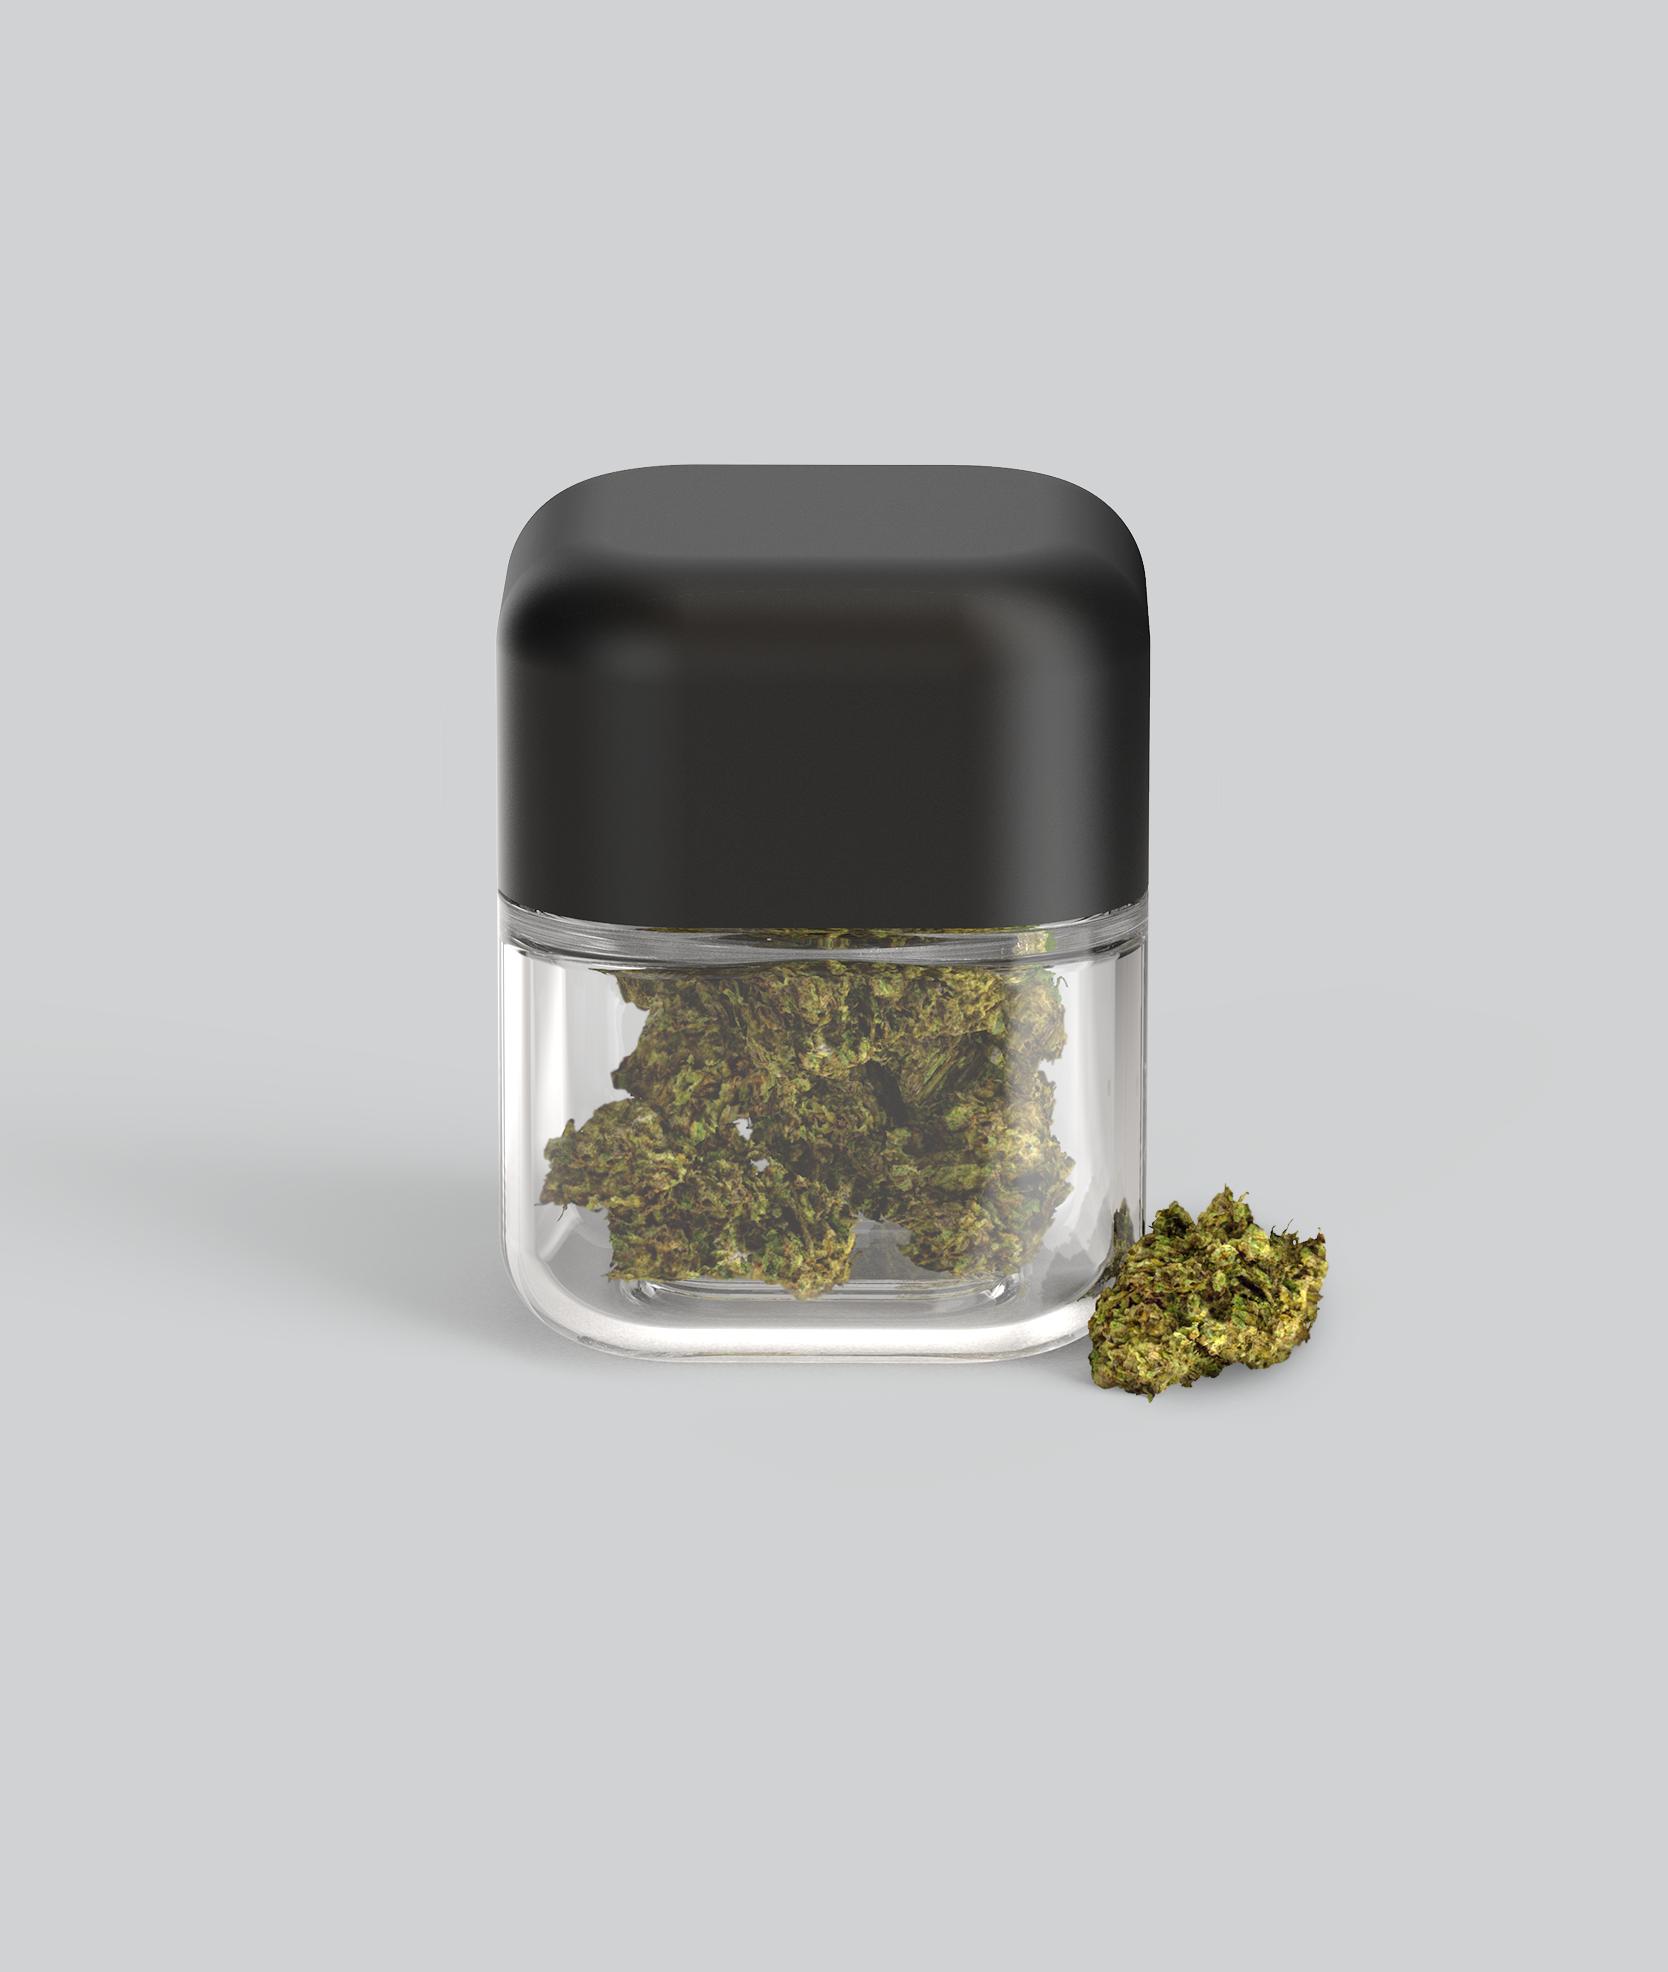 softsquare-marijuana-edible-packaging